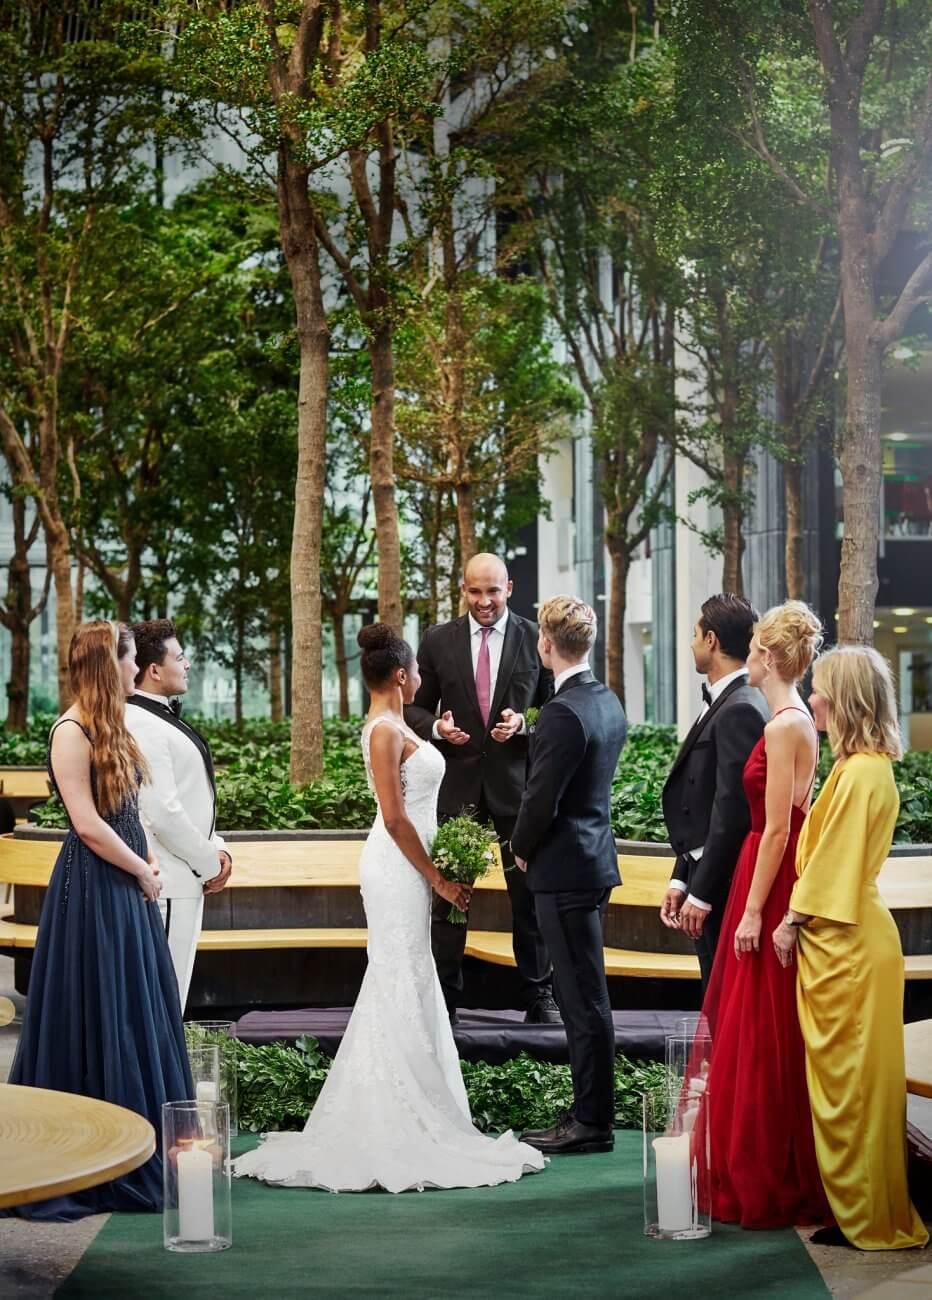 bryllupslokation i skoven